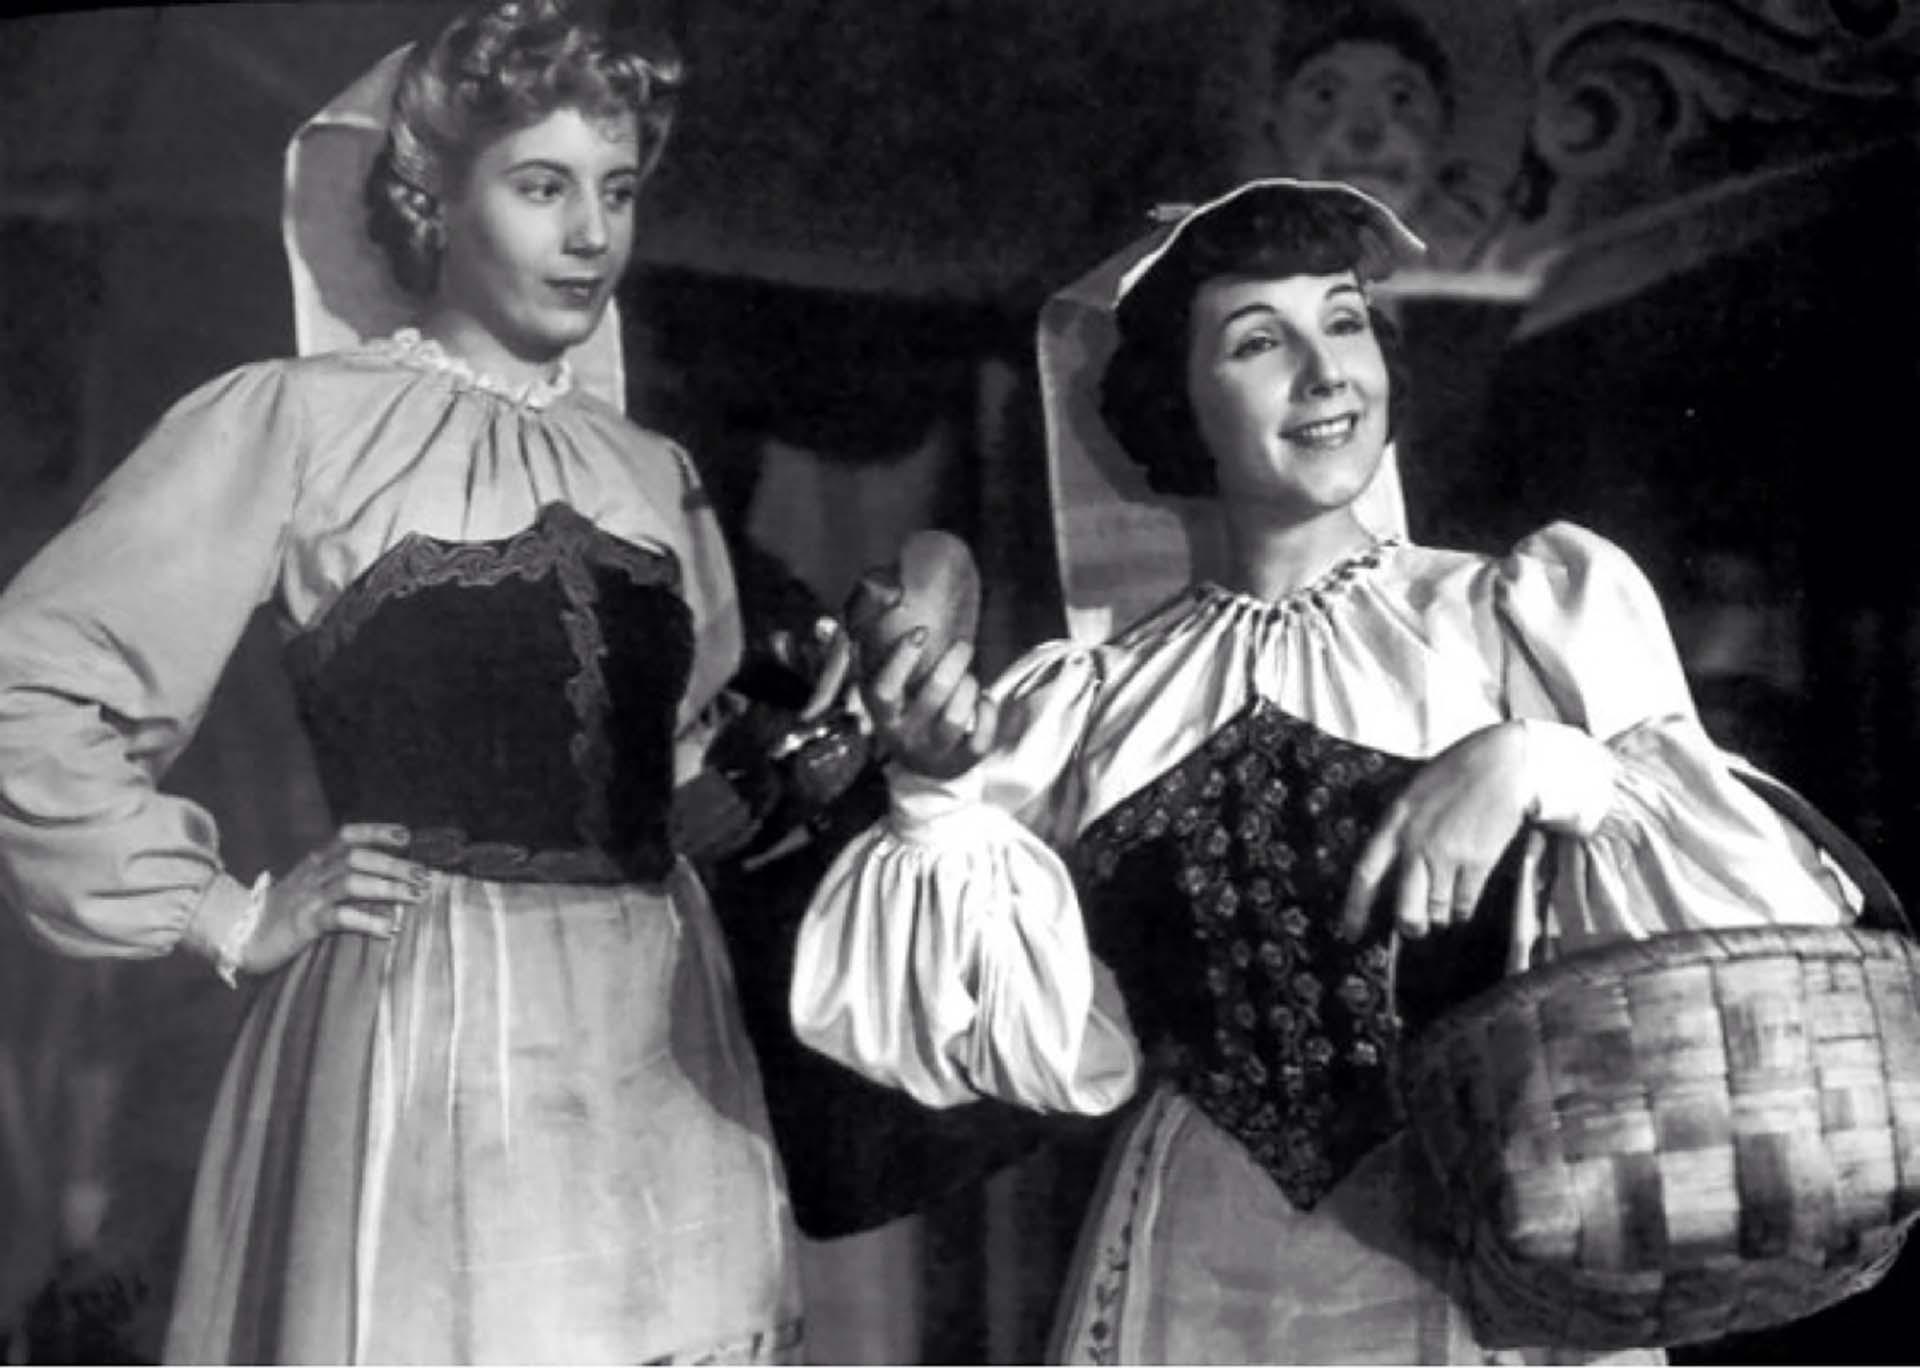 Eva Duarte y Libertad Lamarque en La cabalgata del circo, 1945.